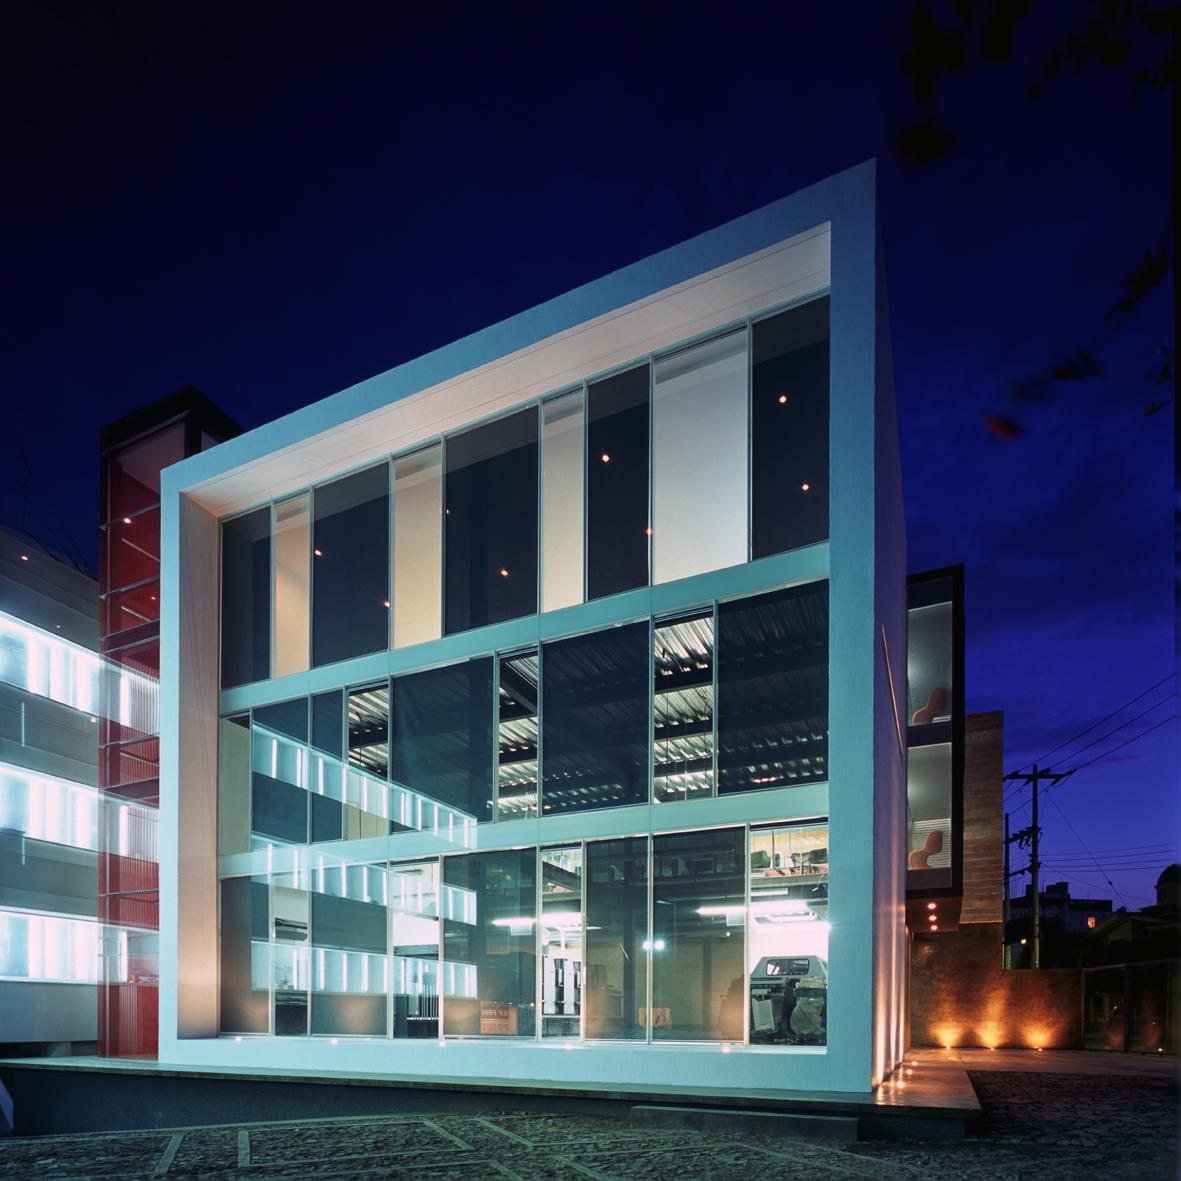 Kp alazraki corporate building ad11 by david basulto my blog for Contemporary office building design